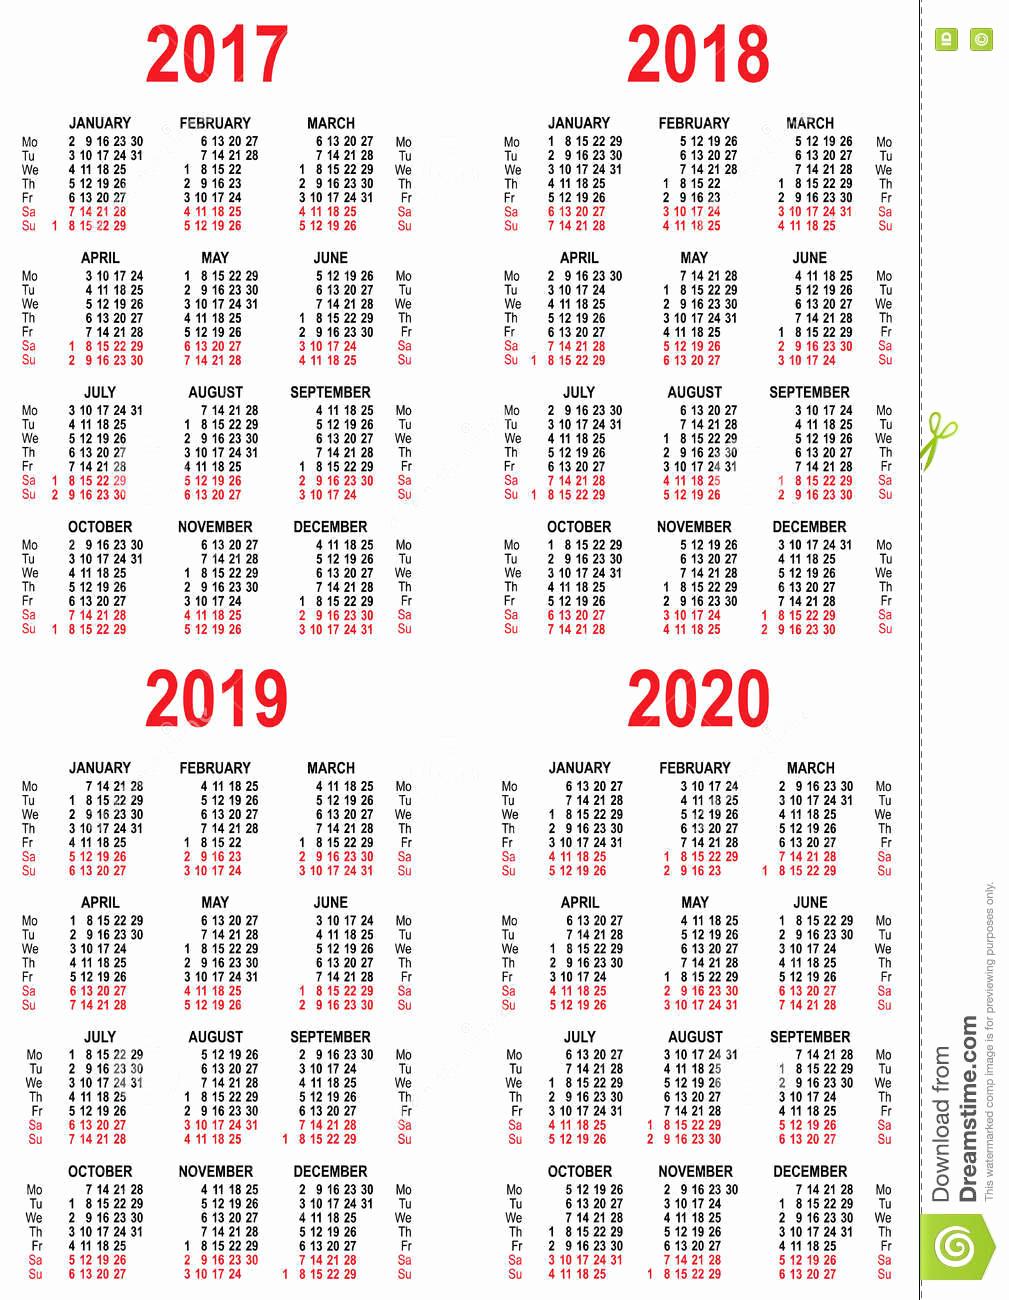 2020 Biweekly Payroll Calendar Template